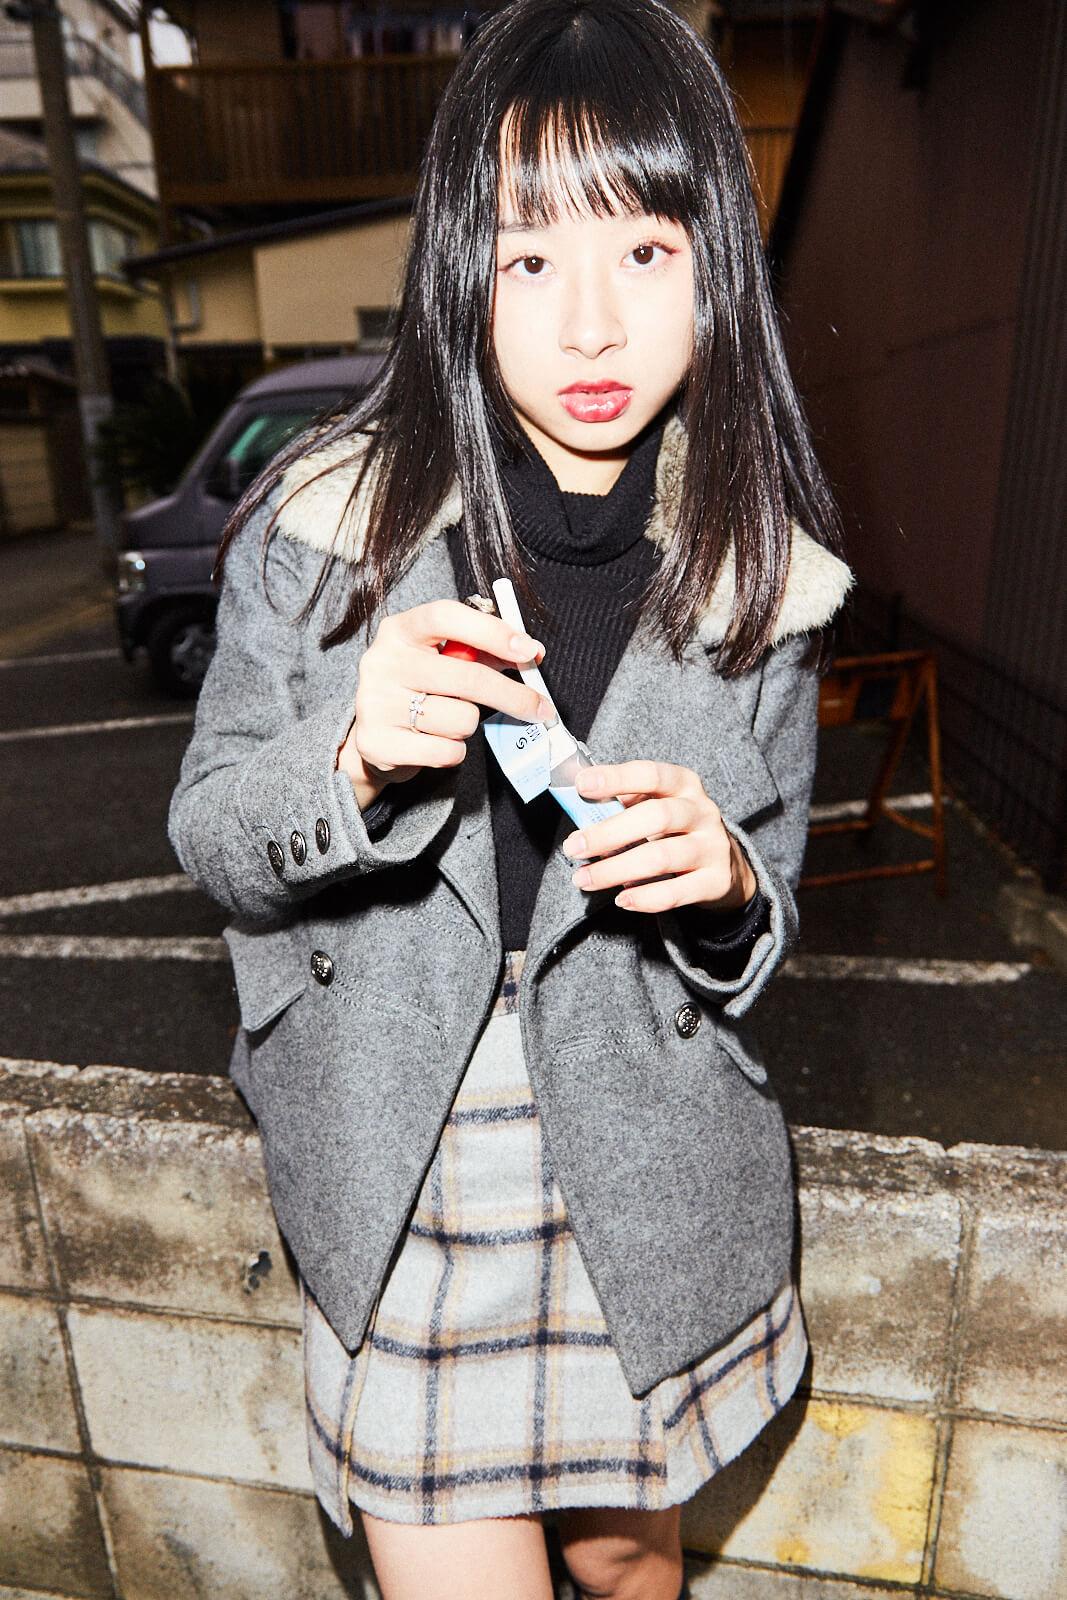 portrait-ling-hui-chou-tokyo-japan